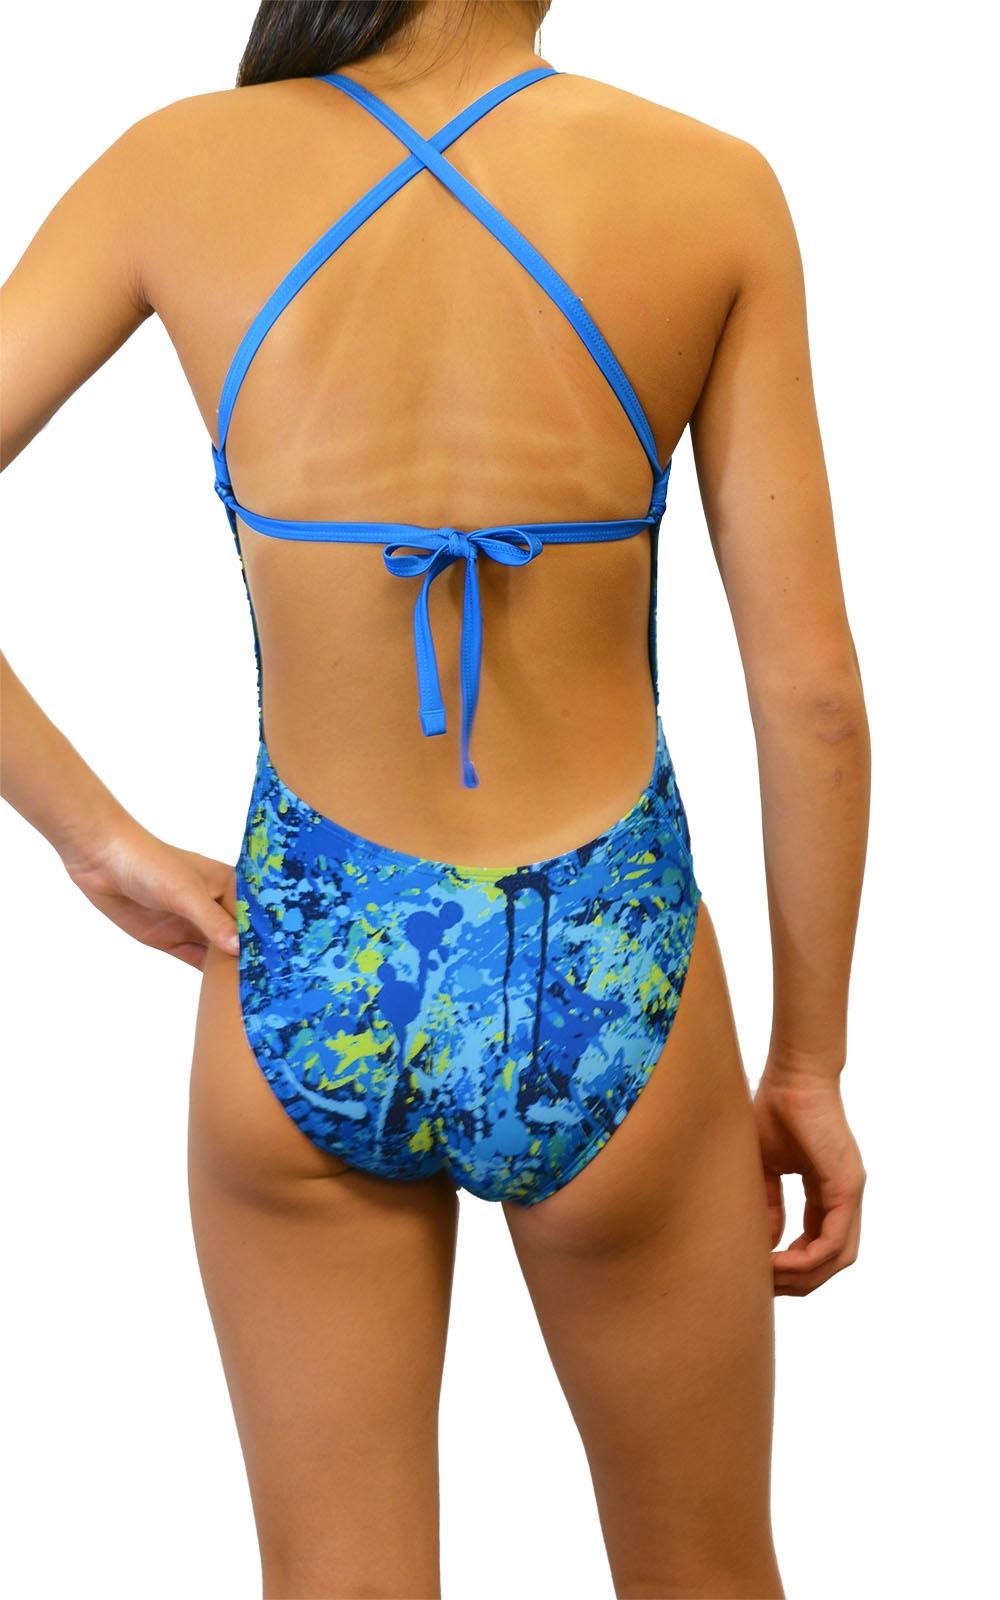 75ae80f5502ff6 Adoretex One Piece Tie-Back Swimsuit